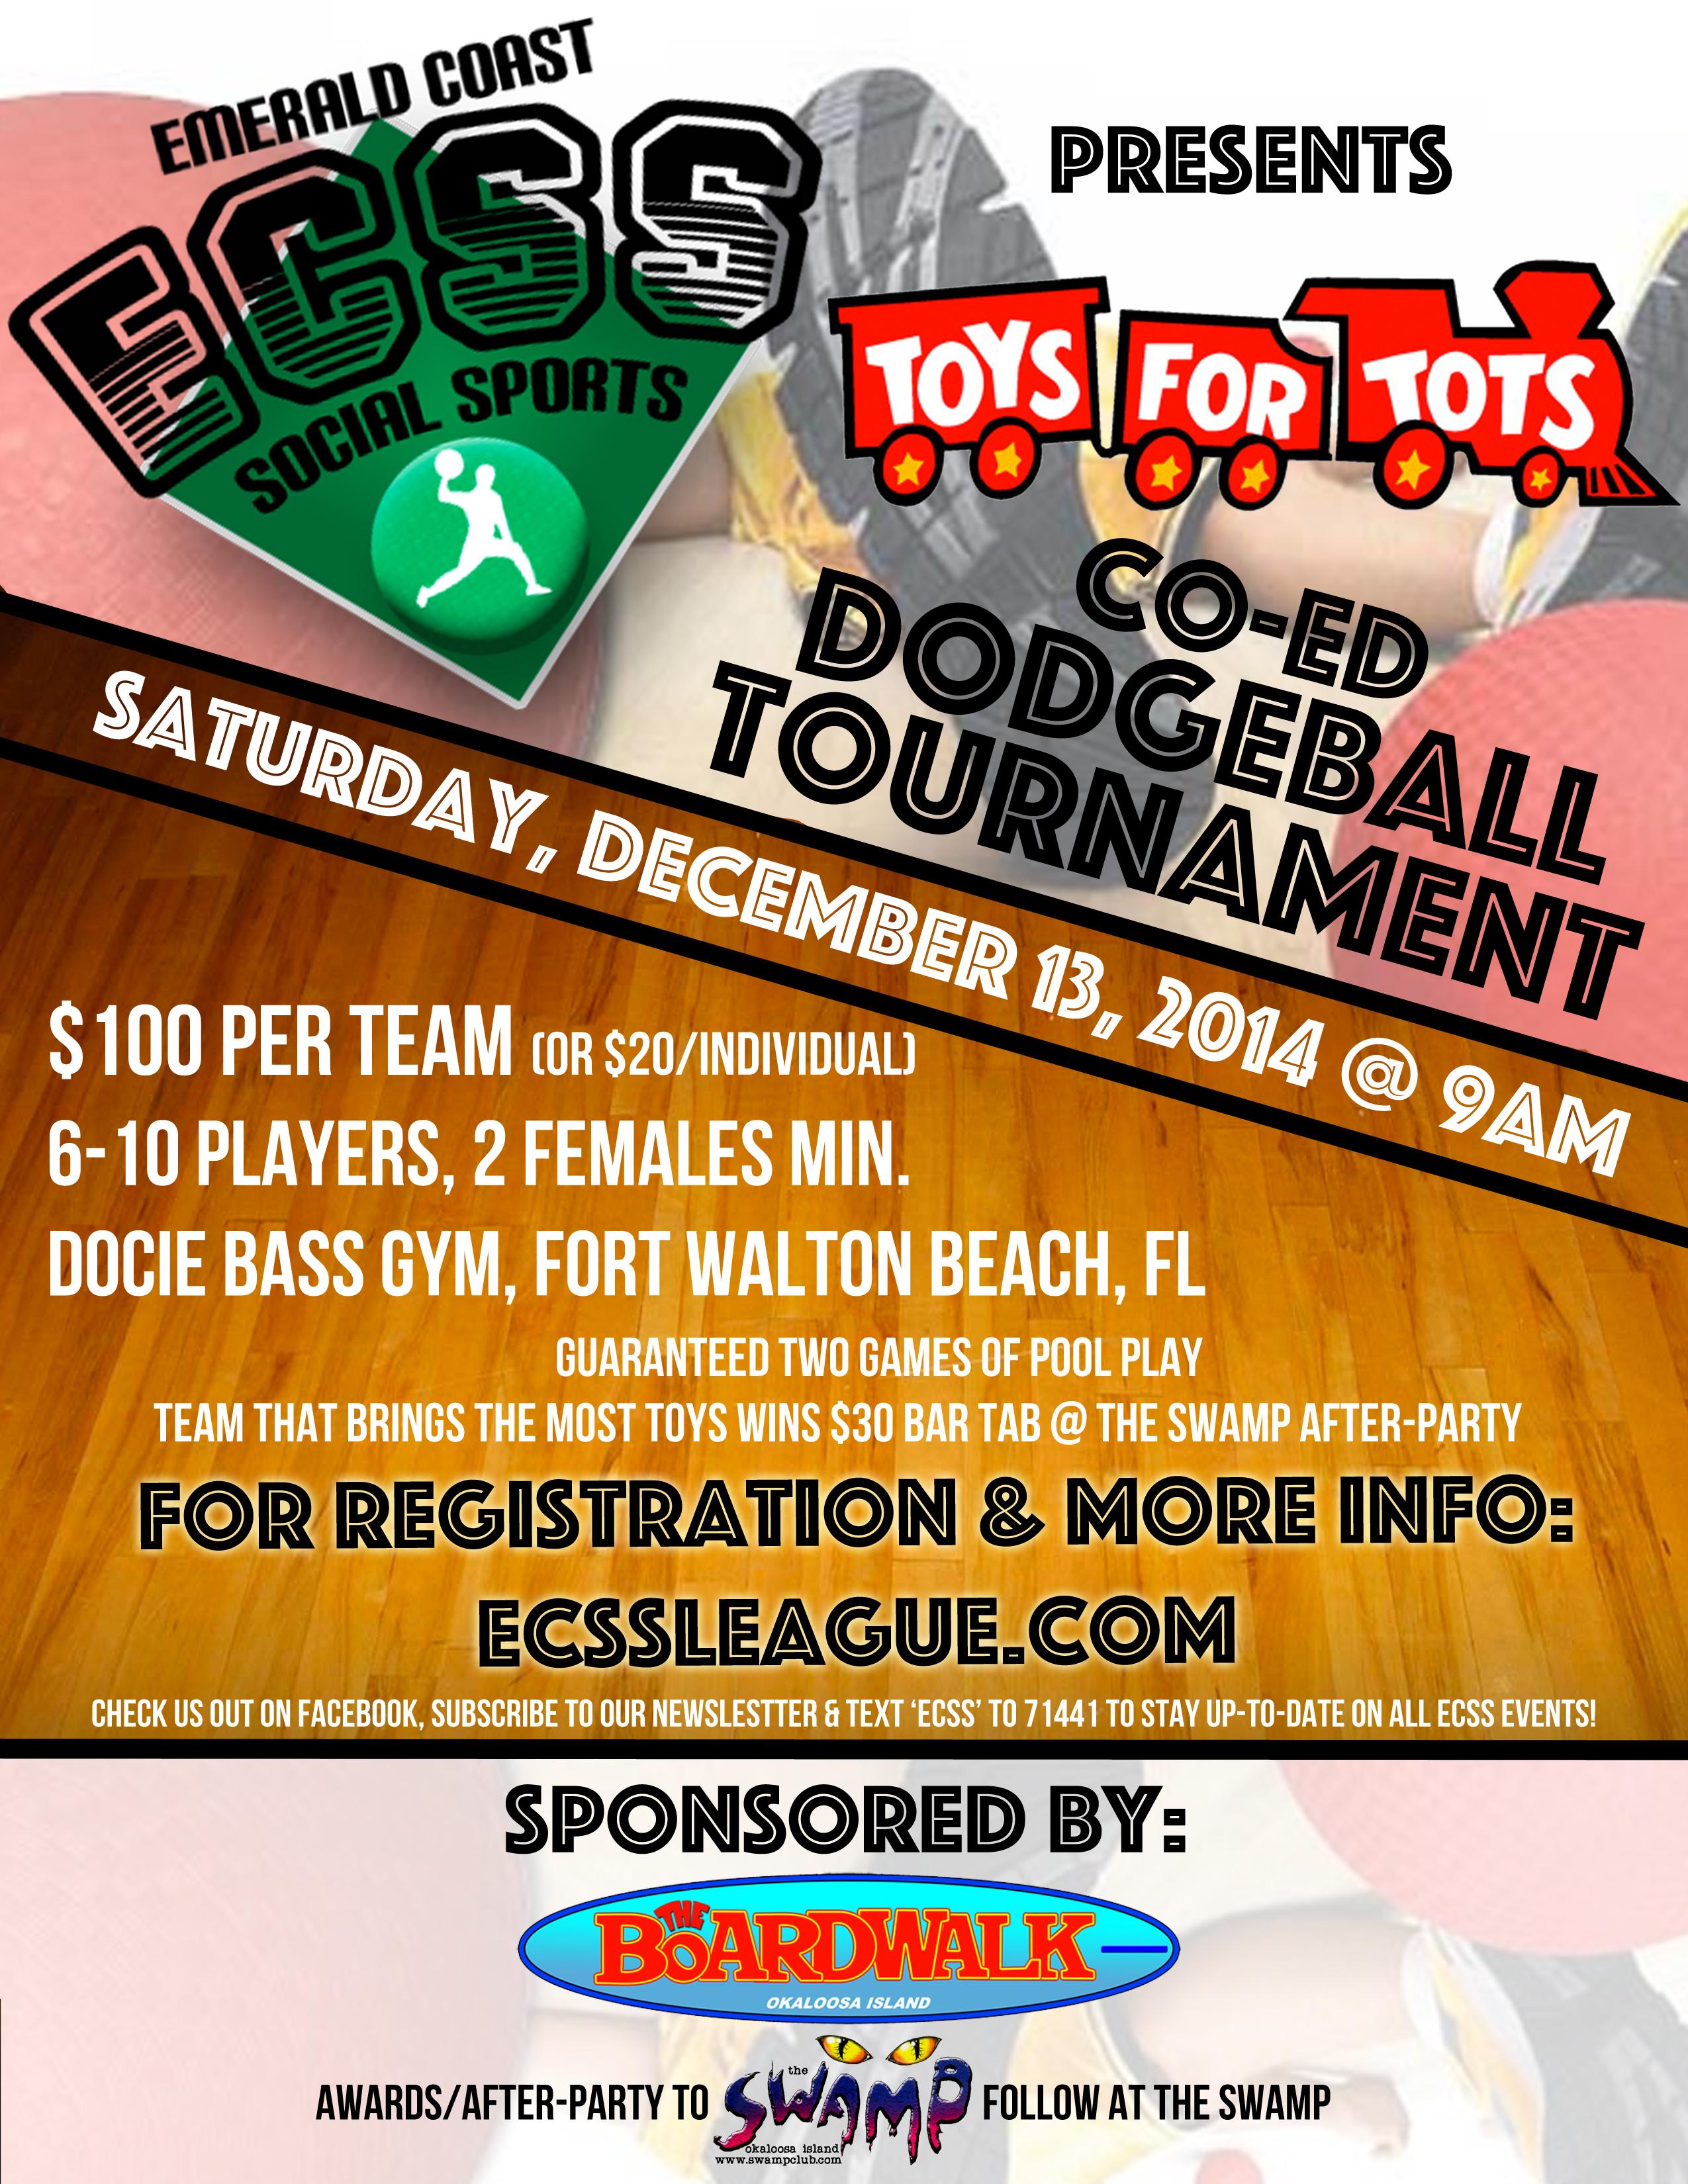 Toys For Tots Registration : Toys tots charity coed dodgeball emerald coast social